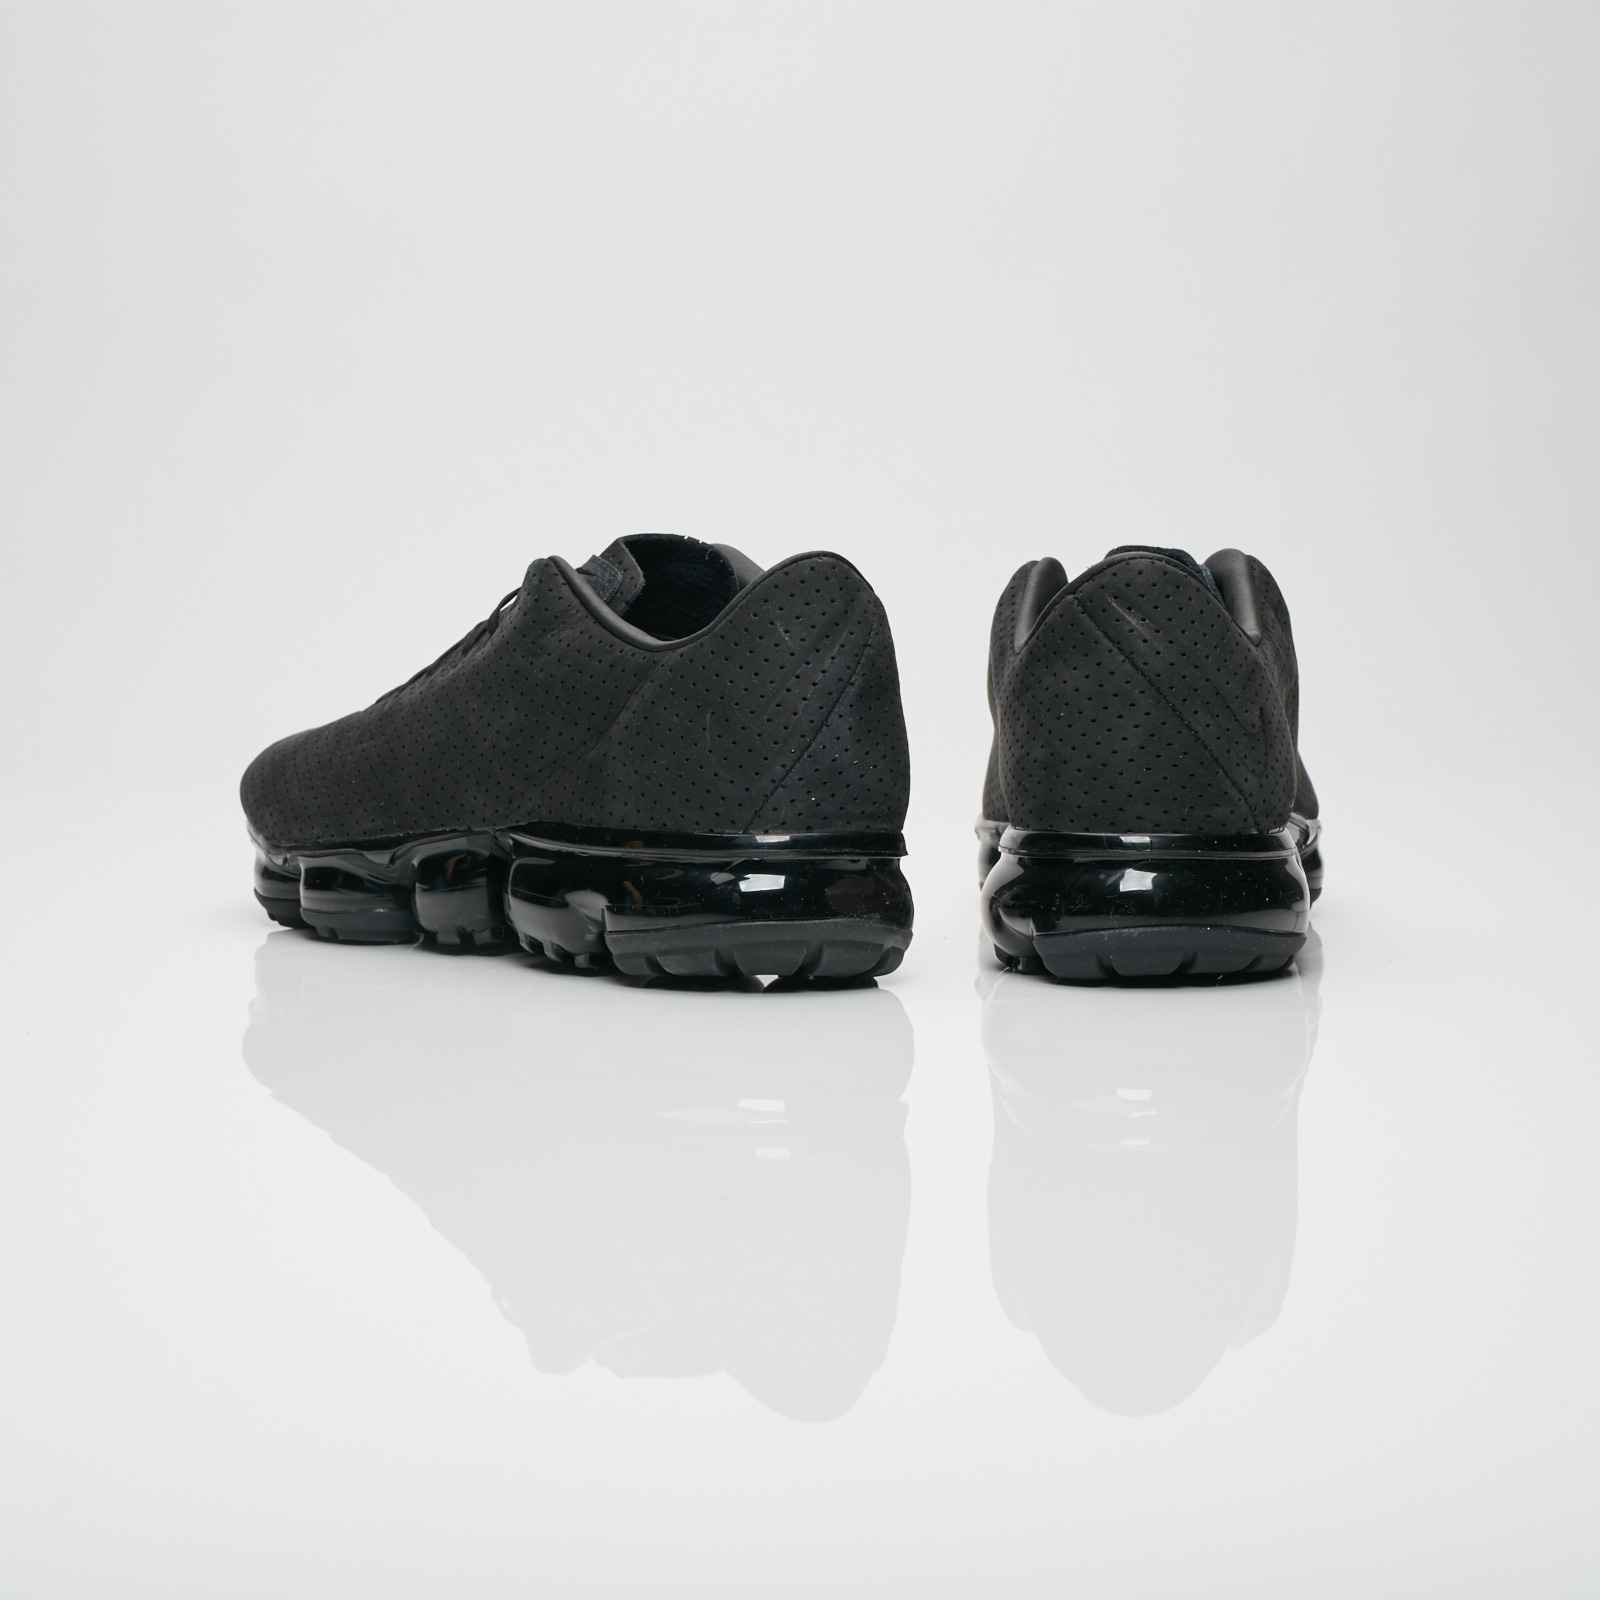 7f75490e557409 Nike Sportswear Air Vapormax LTR Nike Sportswear Air Vapormax LTR ...